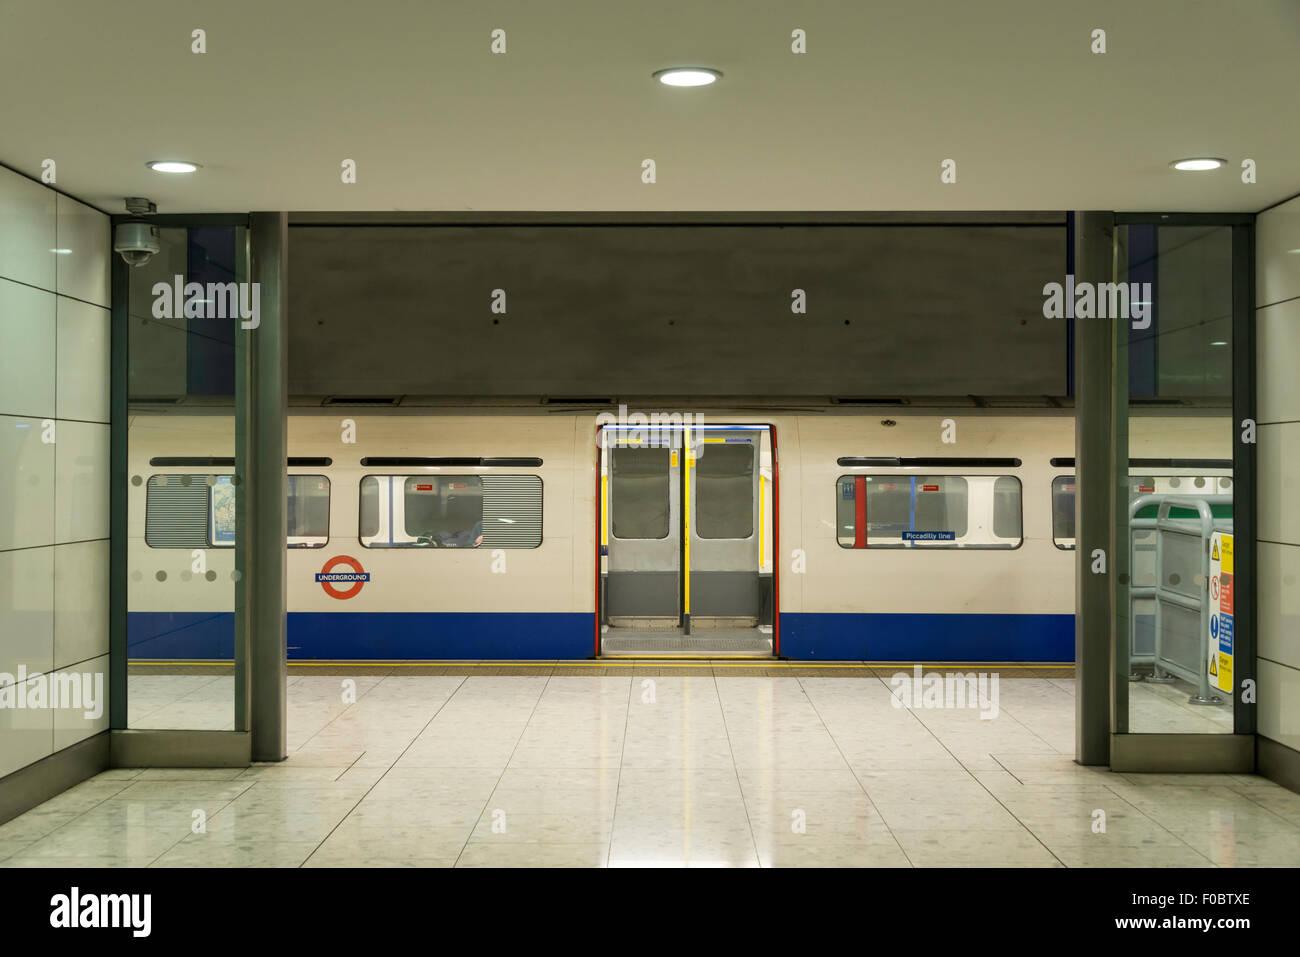 Train at platform, Terminal 5 Underground, Heathrow Airport. London Borough of Hounslow, Greater London, England, - Stock Image